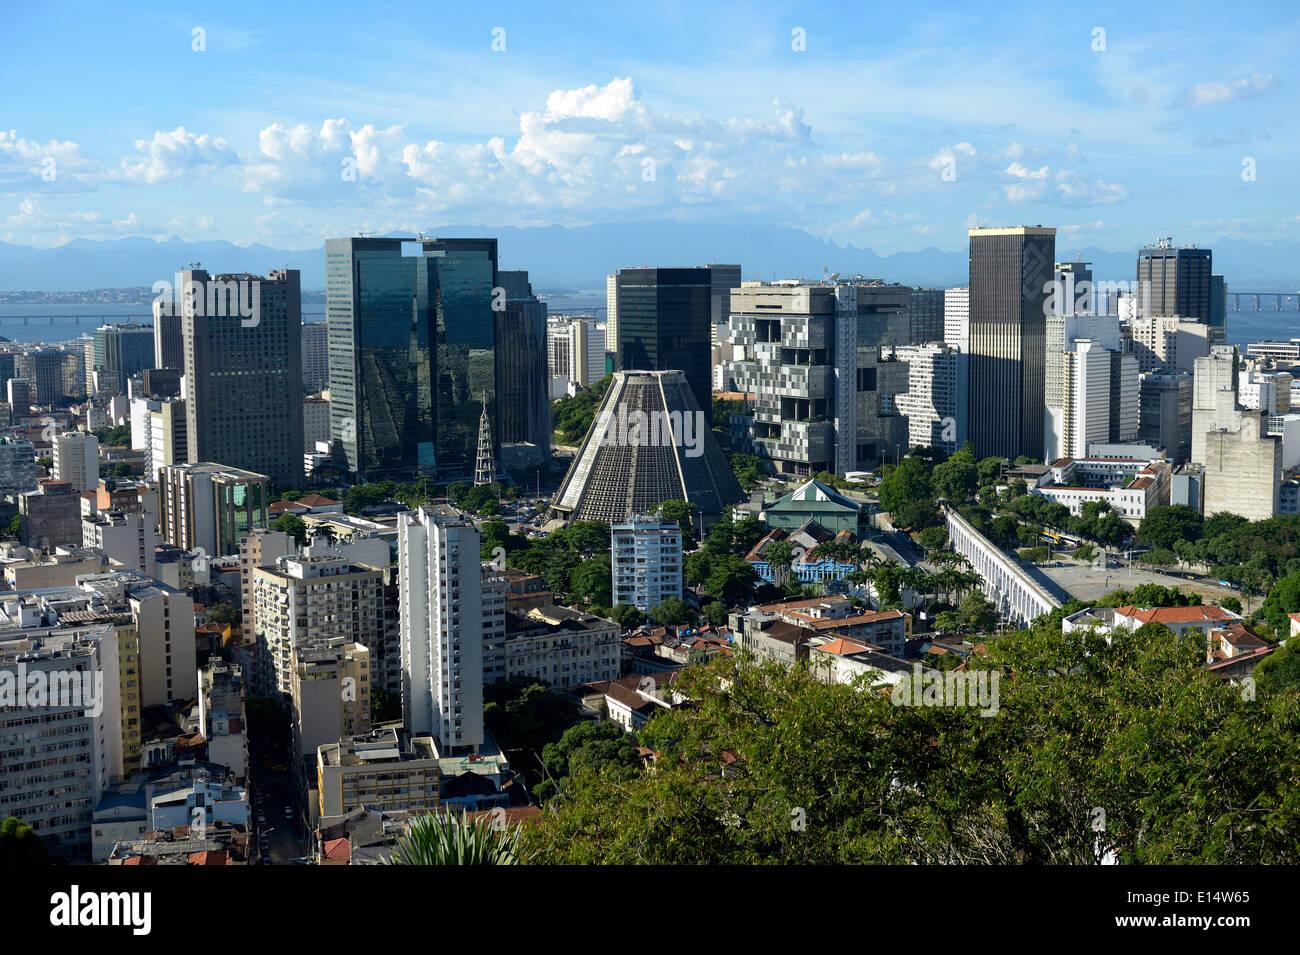 Skyscrapers and Cathedral of Rio de Janeiro, Rio de Janeiro State, Brazil - Stock Image